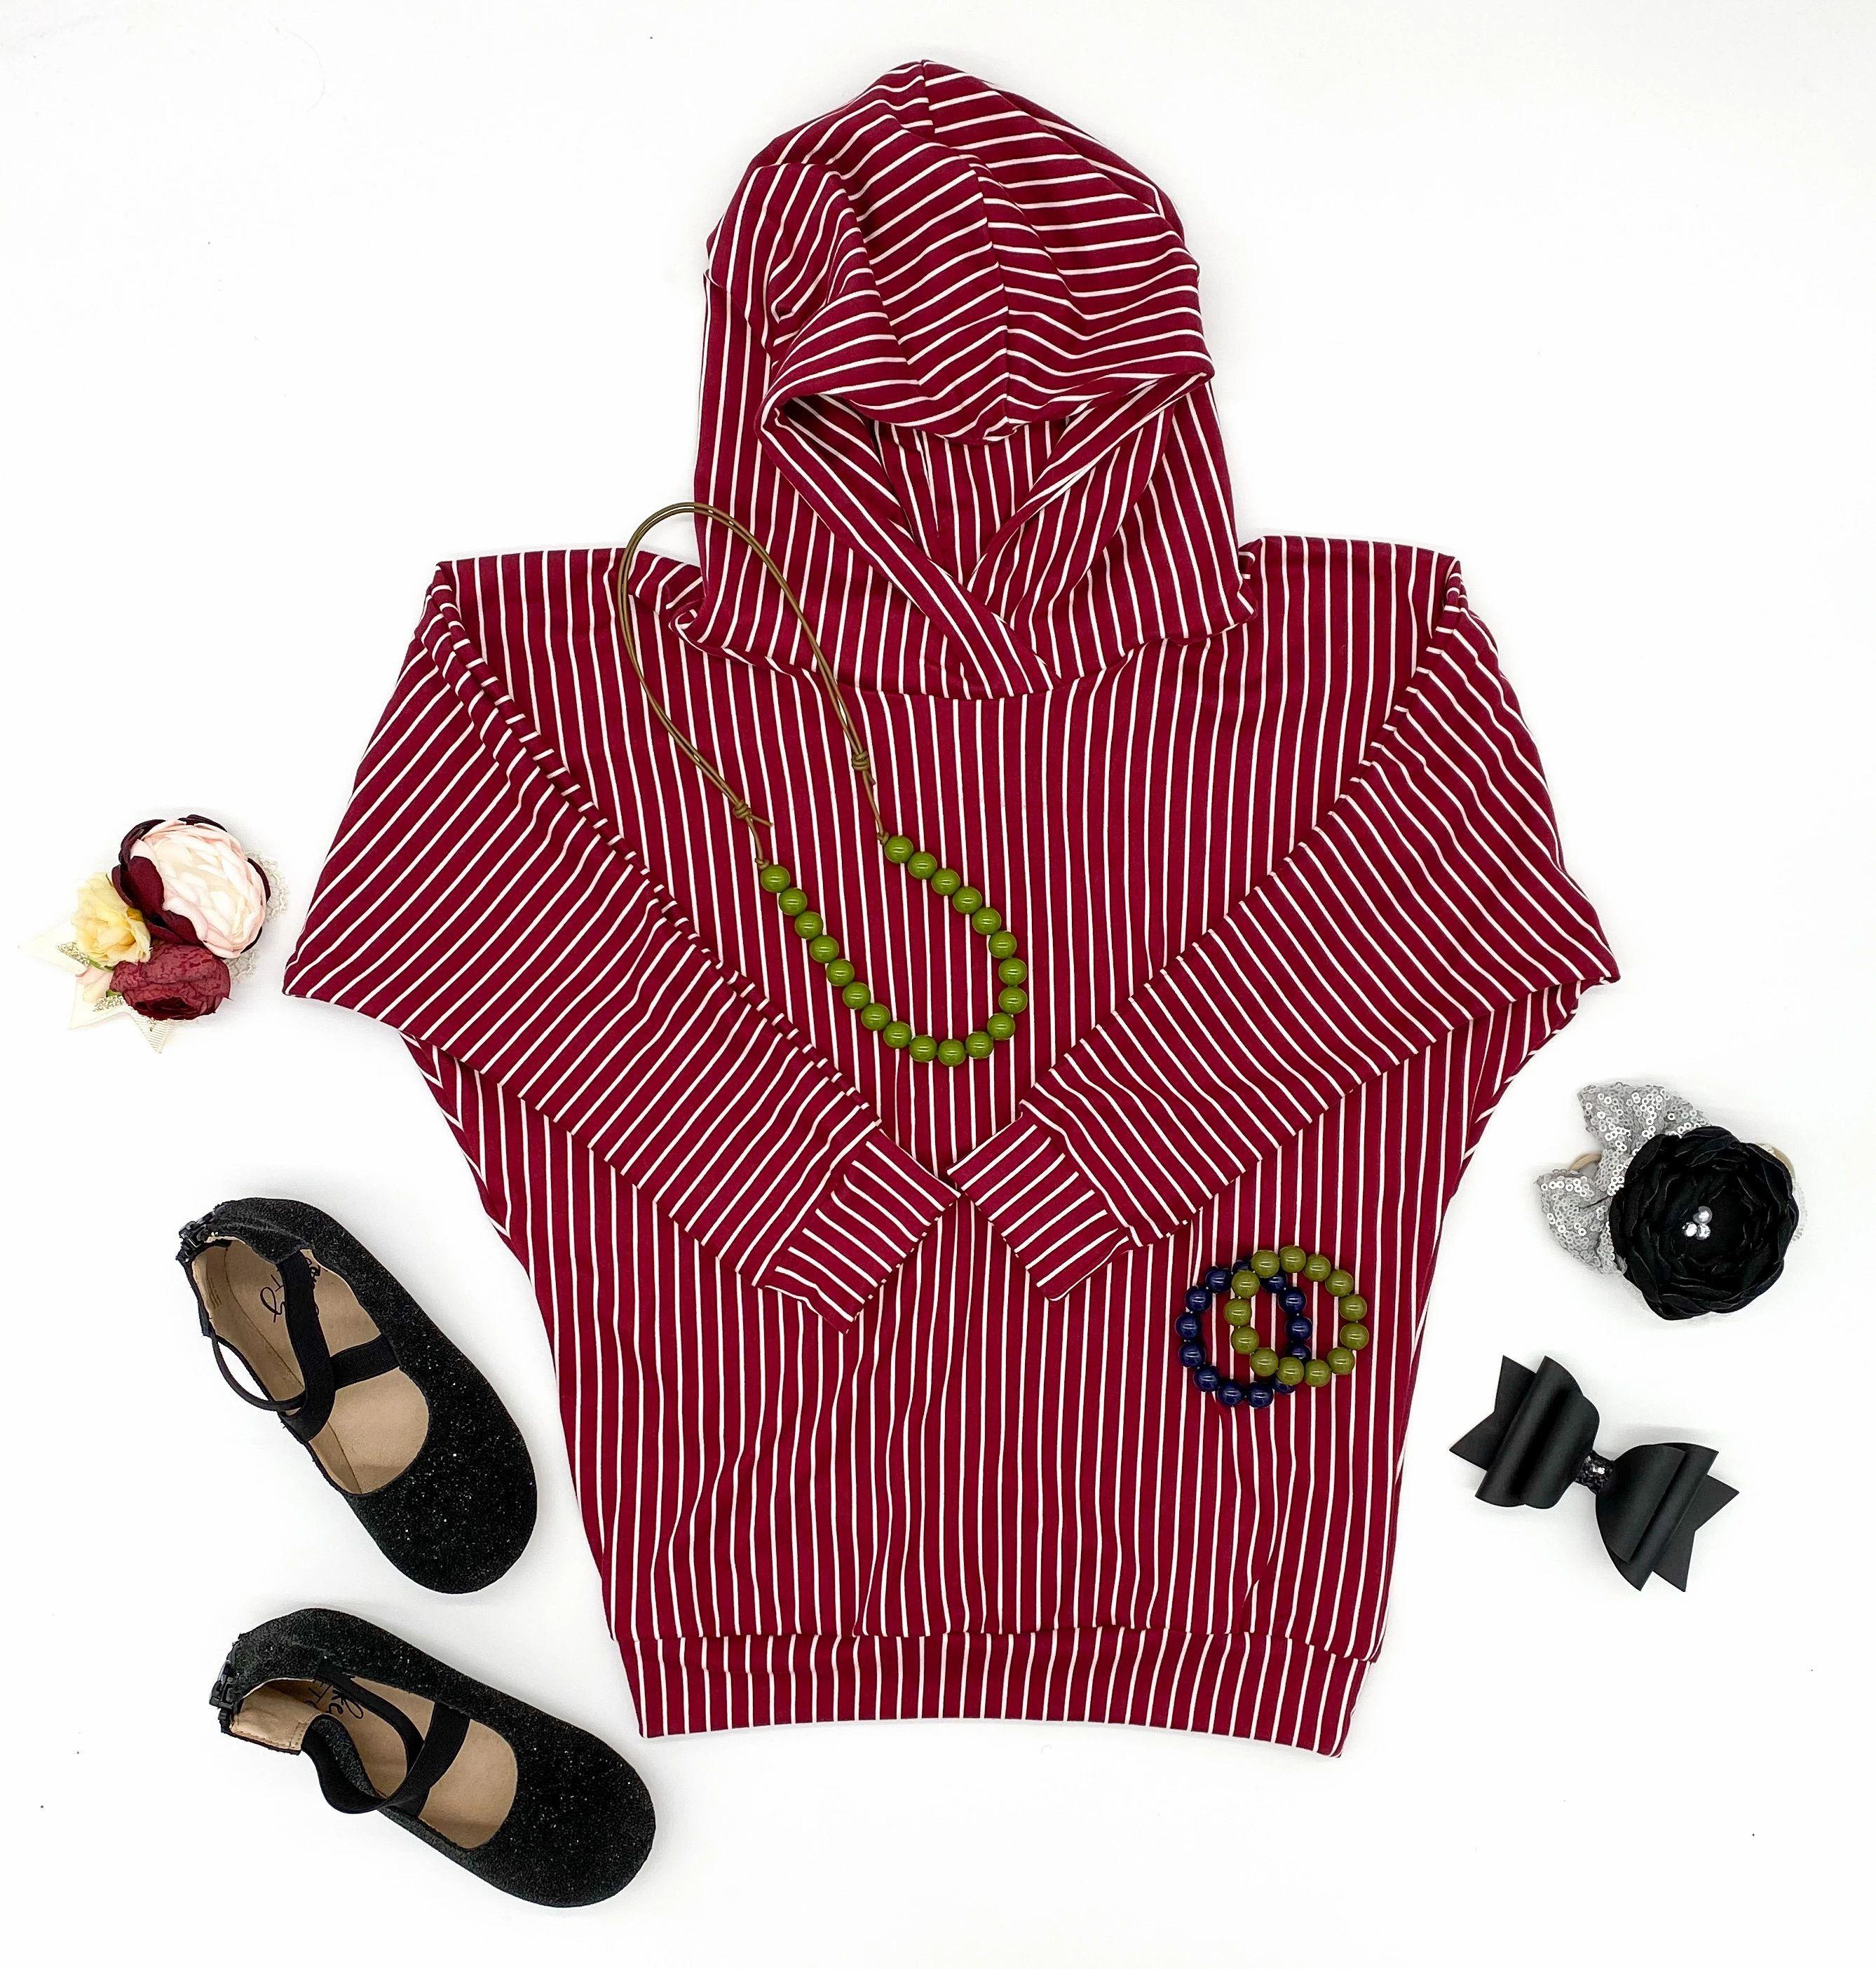 Mkb Sizes 5 8 In 2020 Handmade Clothes Baby Winter Handmade Fashion